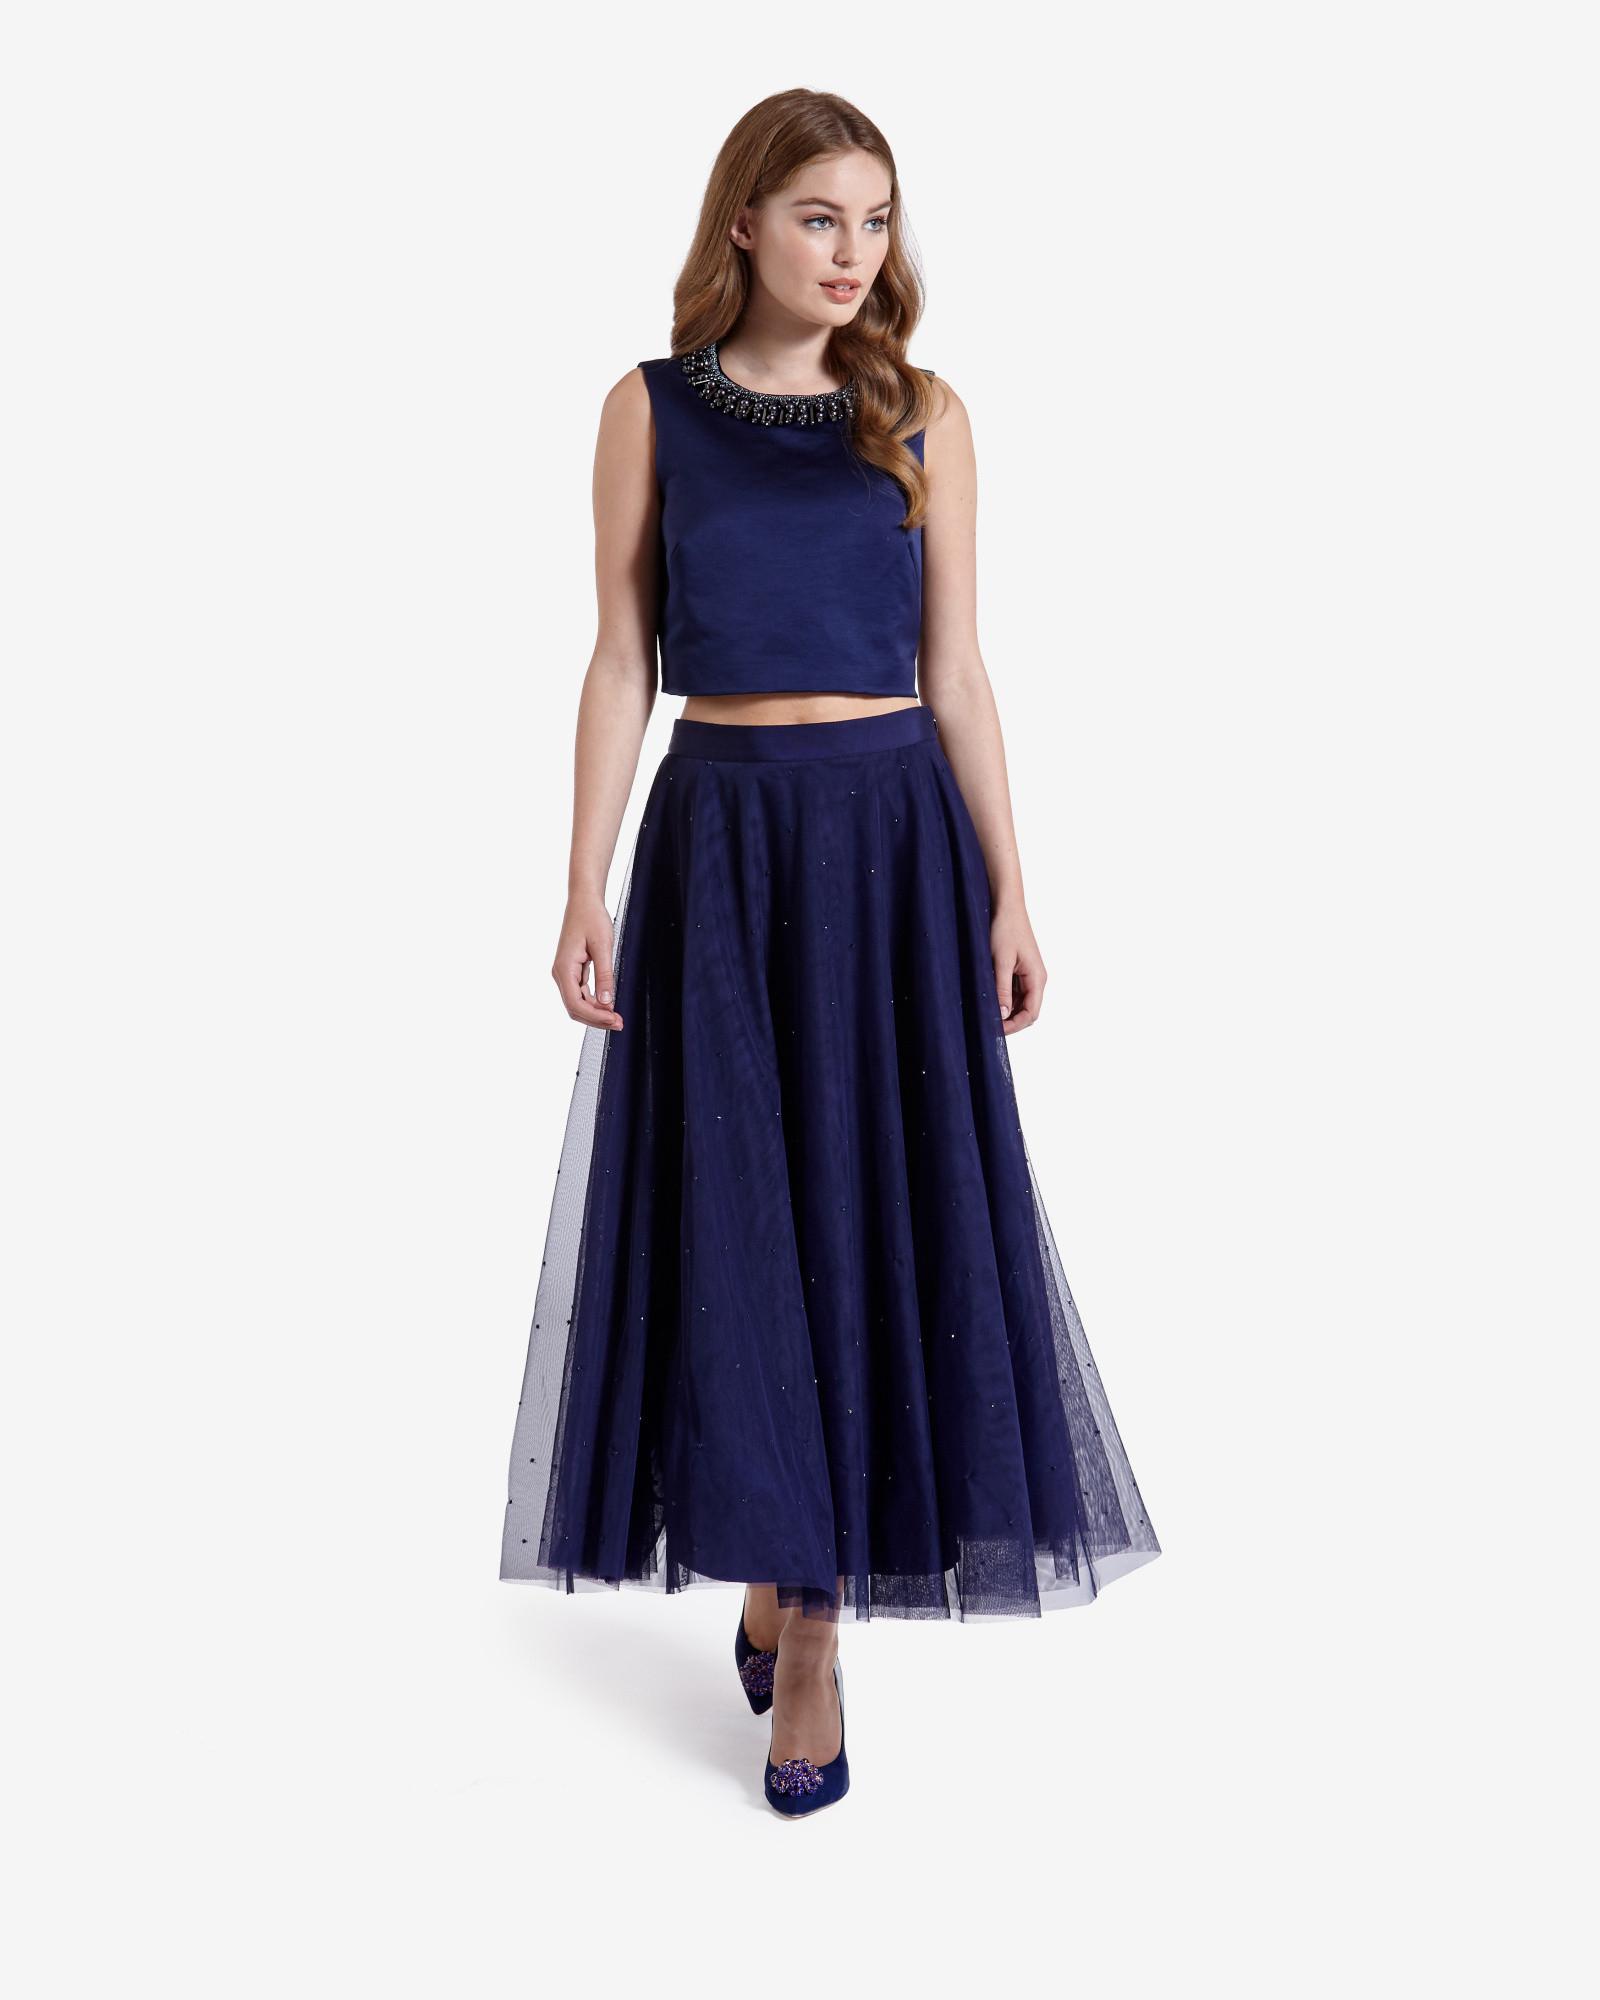 d4aeece6ec Ted Baker Odella Netted Tutu Skirt in Blue - Lyst